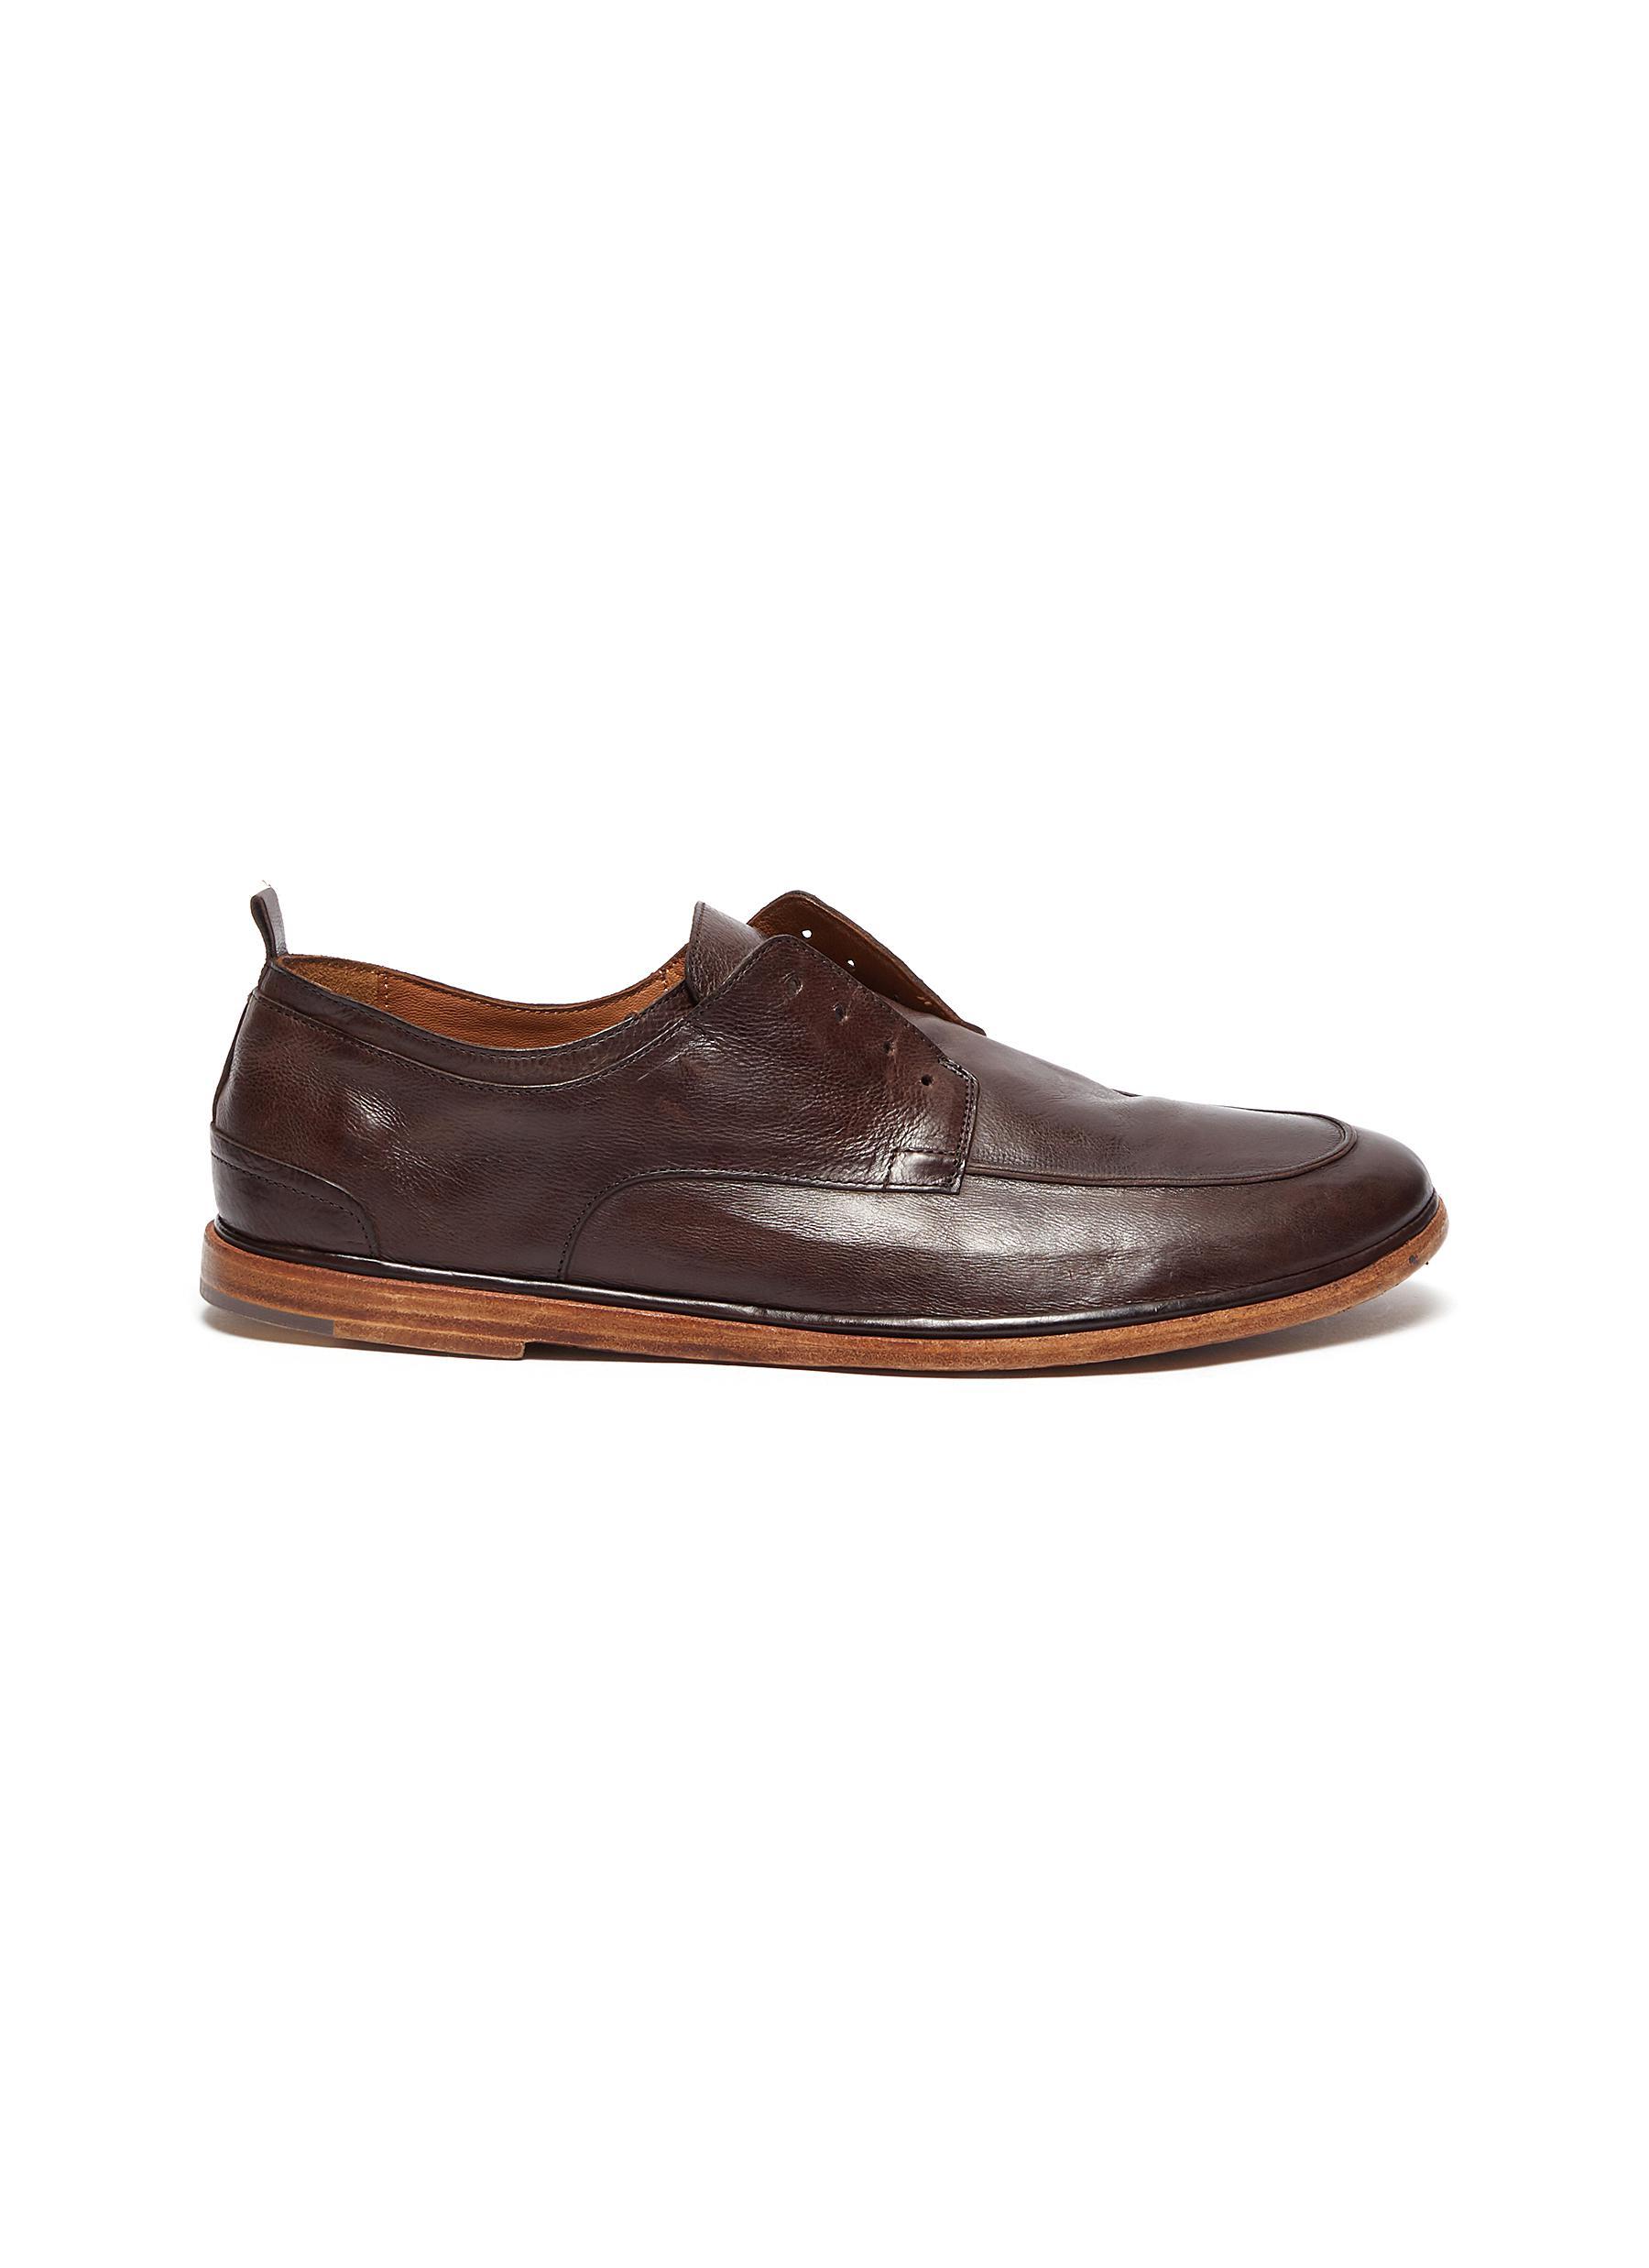 'Todi' laceless derby shoes